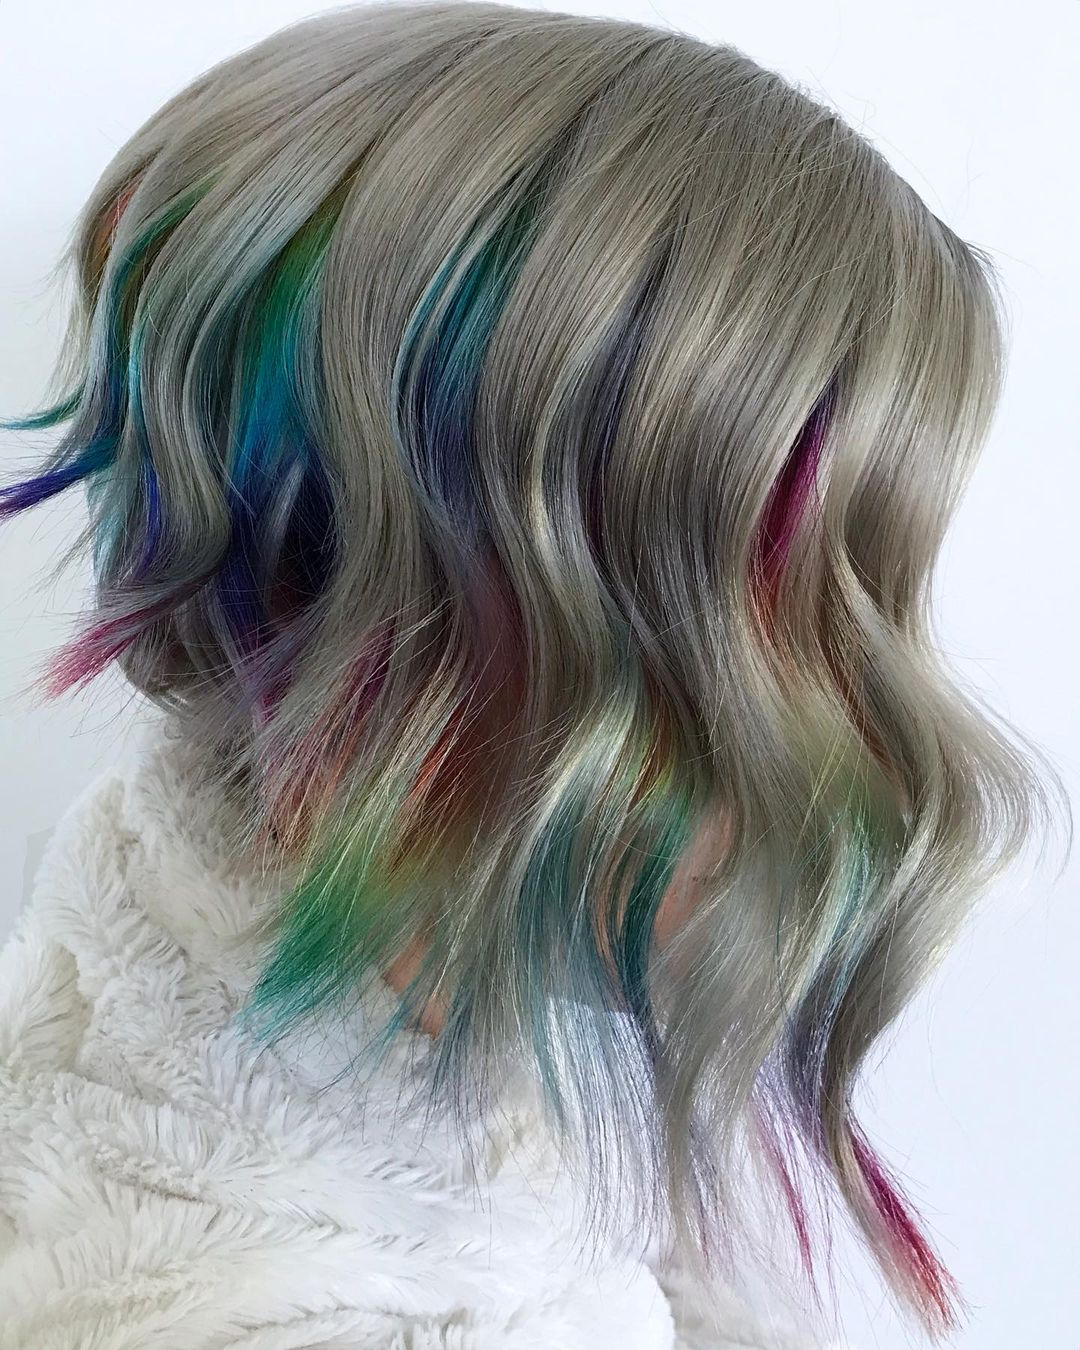 Short Rainbow Peek-a-Boo Hair